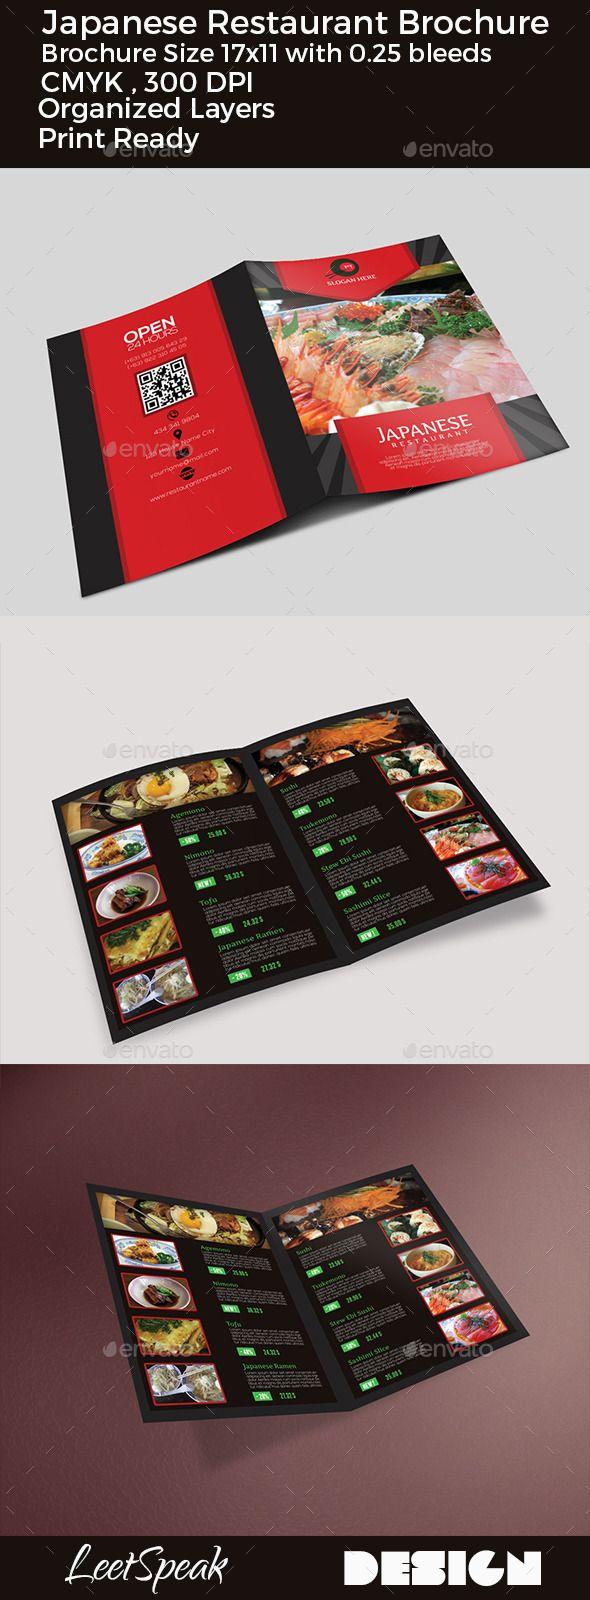 25 best ideas about Restaurant brochure – Restarunt Brochure